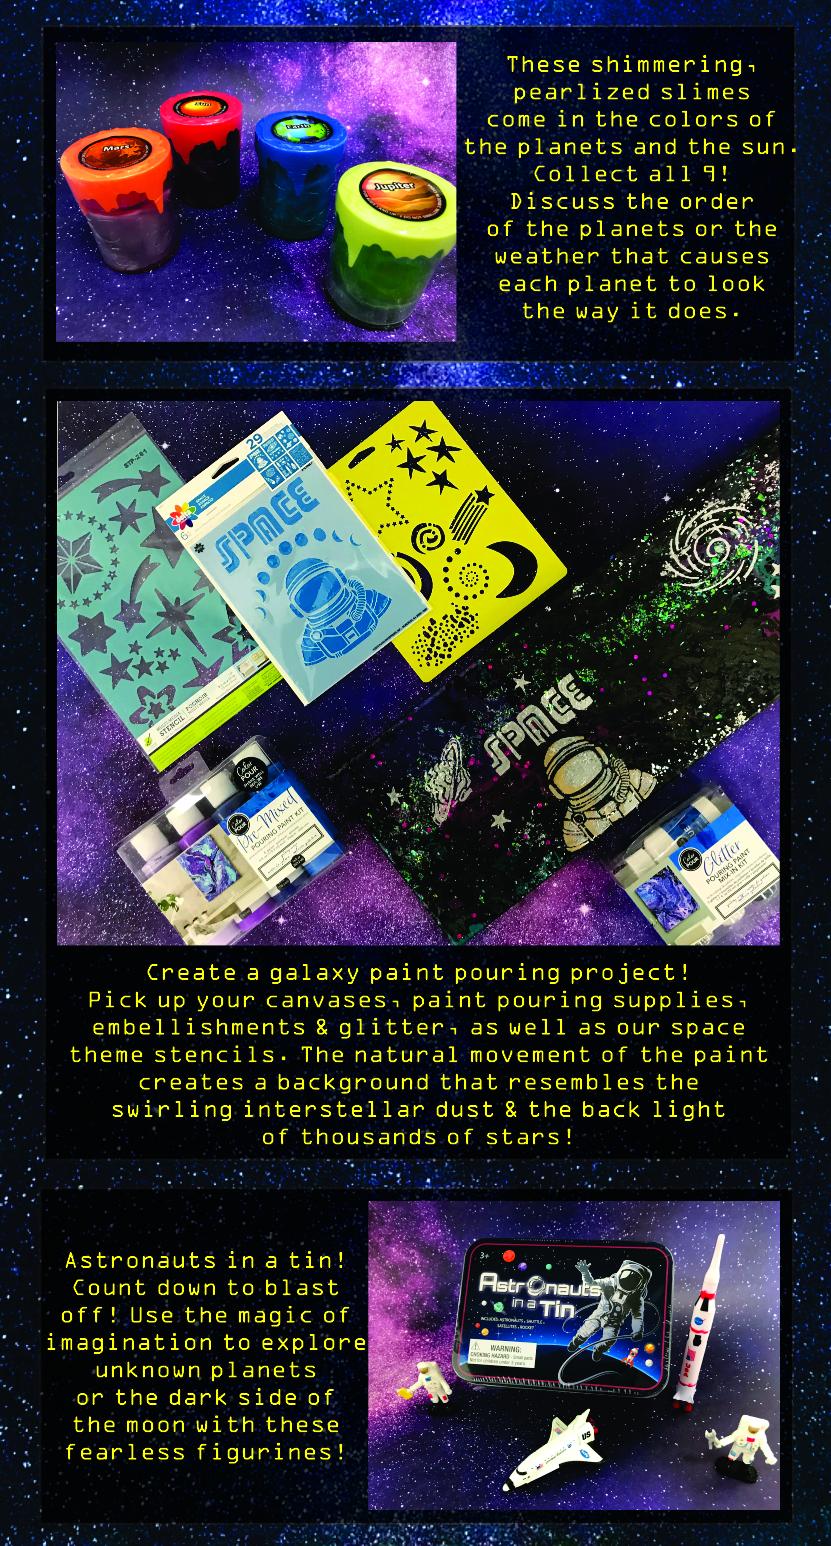 Lunar Landing Ad p2.jpg